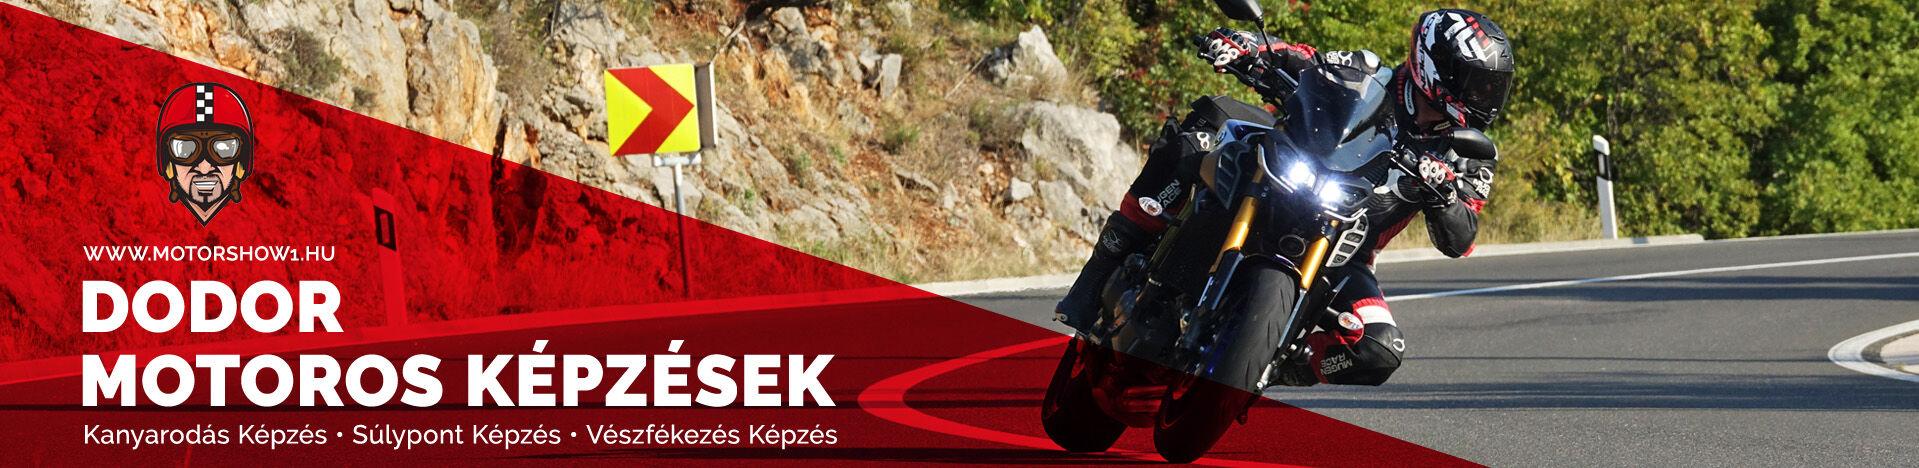 2020_3fele_kepzes